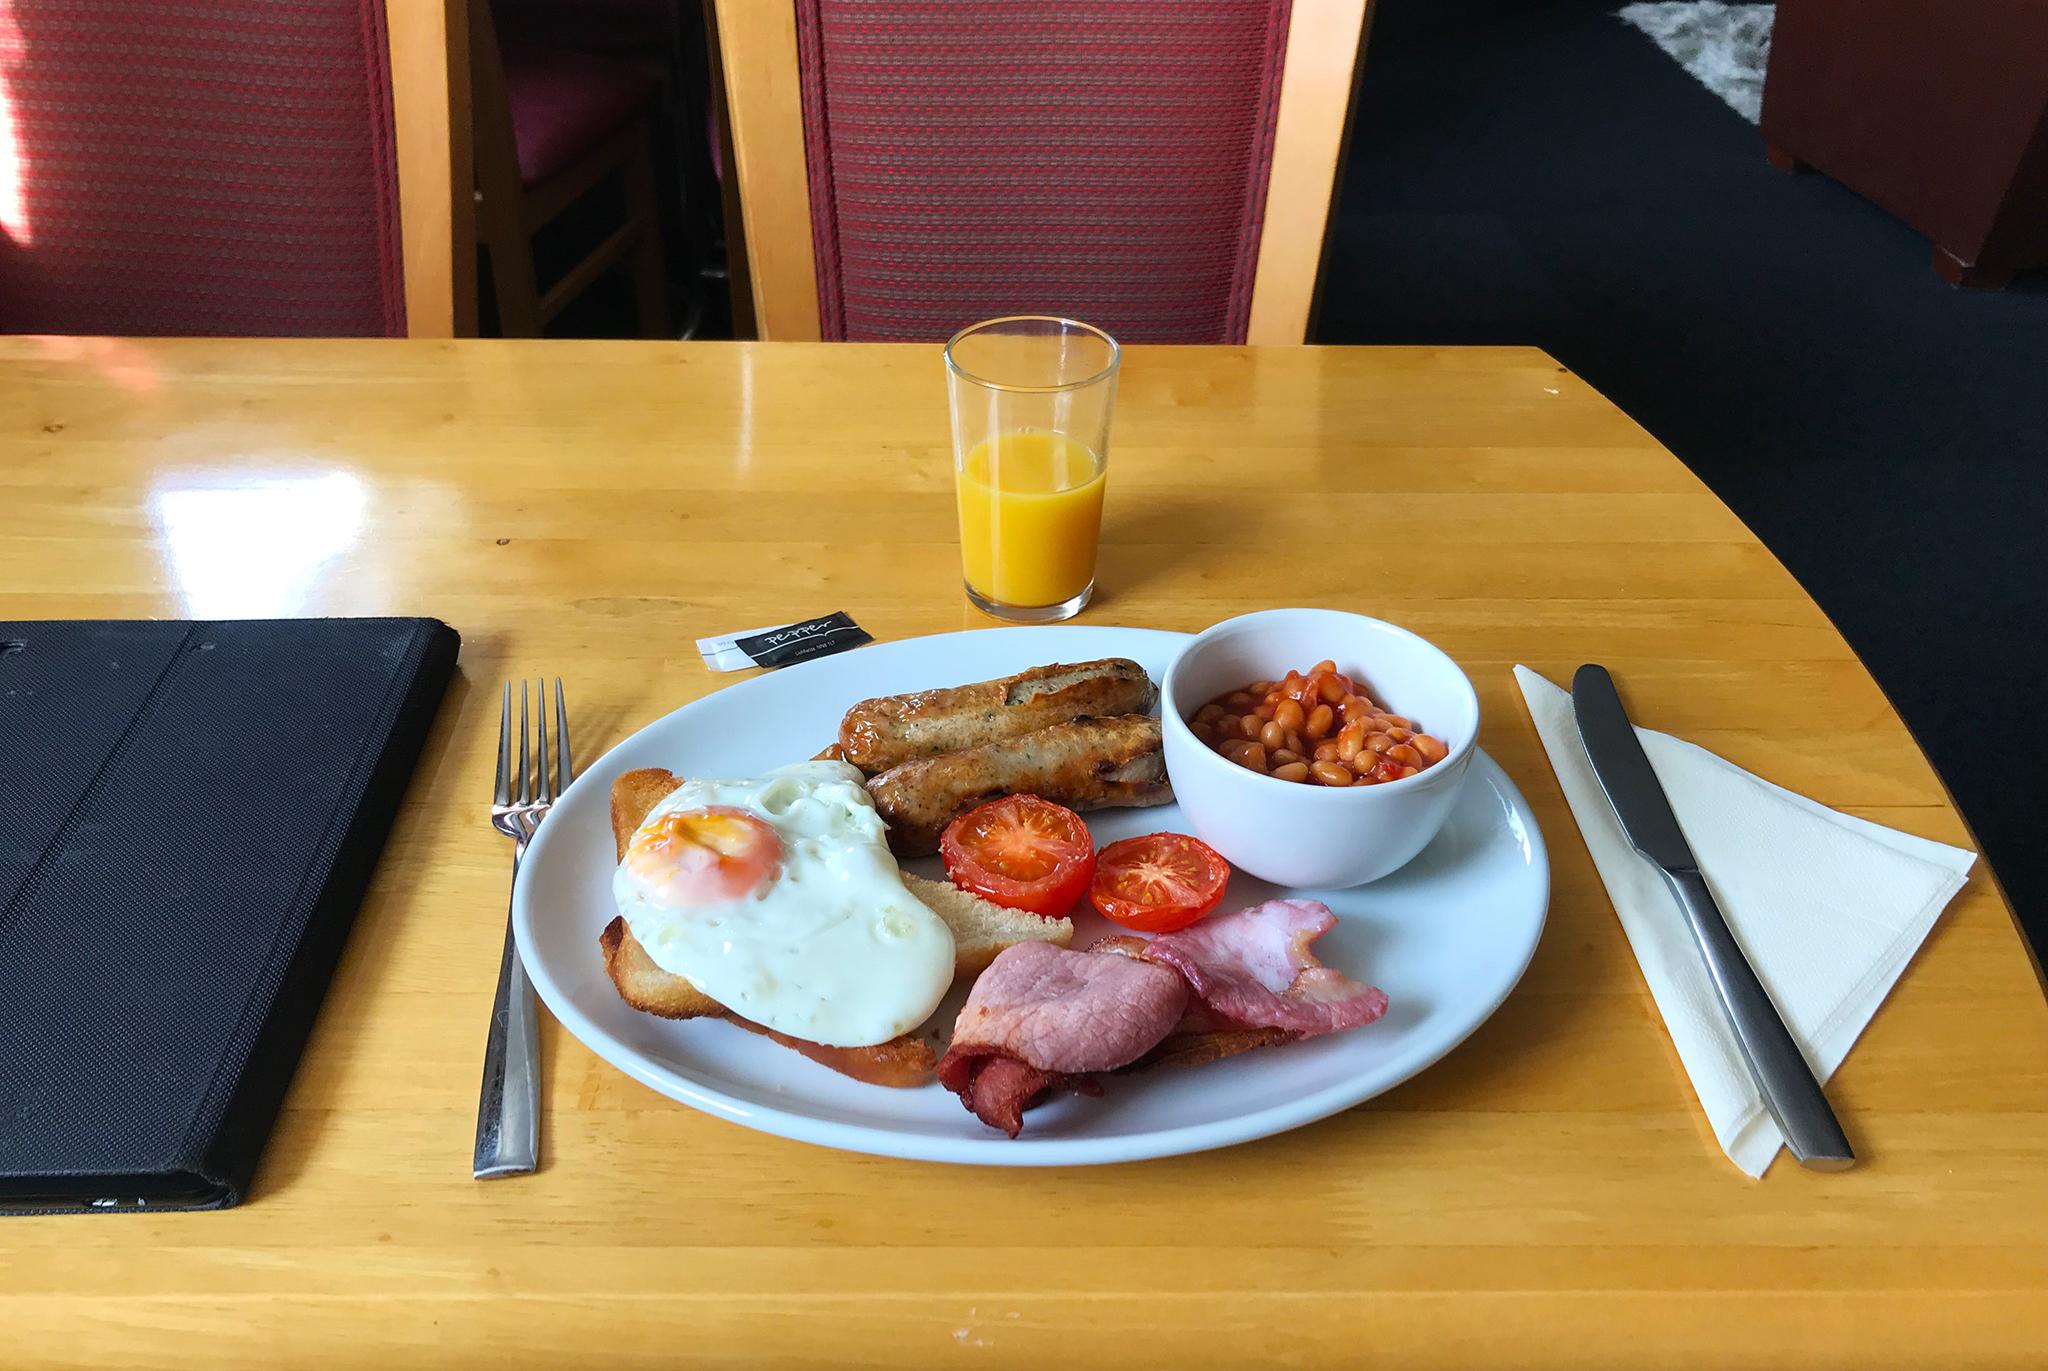 English breakfast light version. A rich Sunday breakfast by my standards!